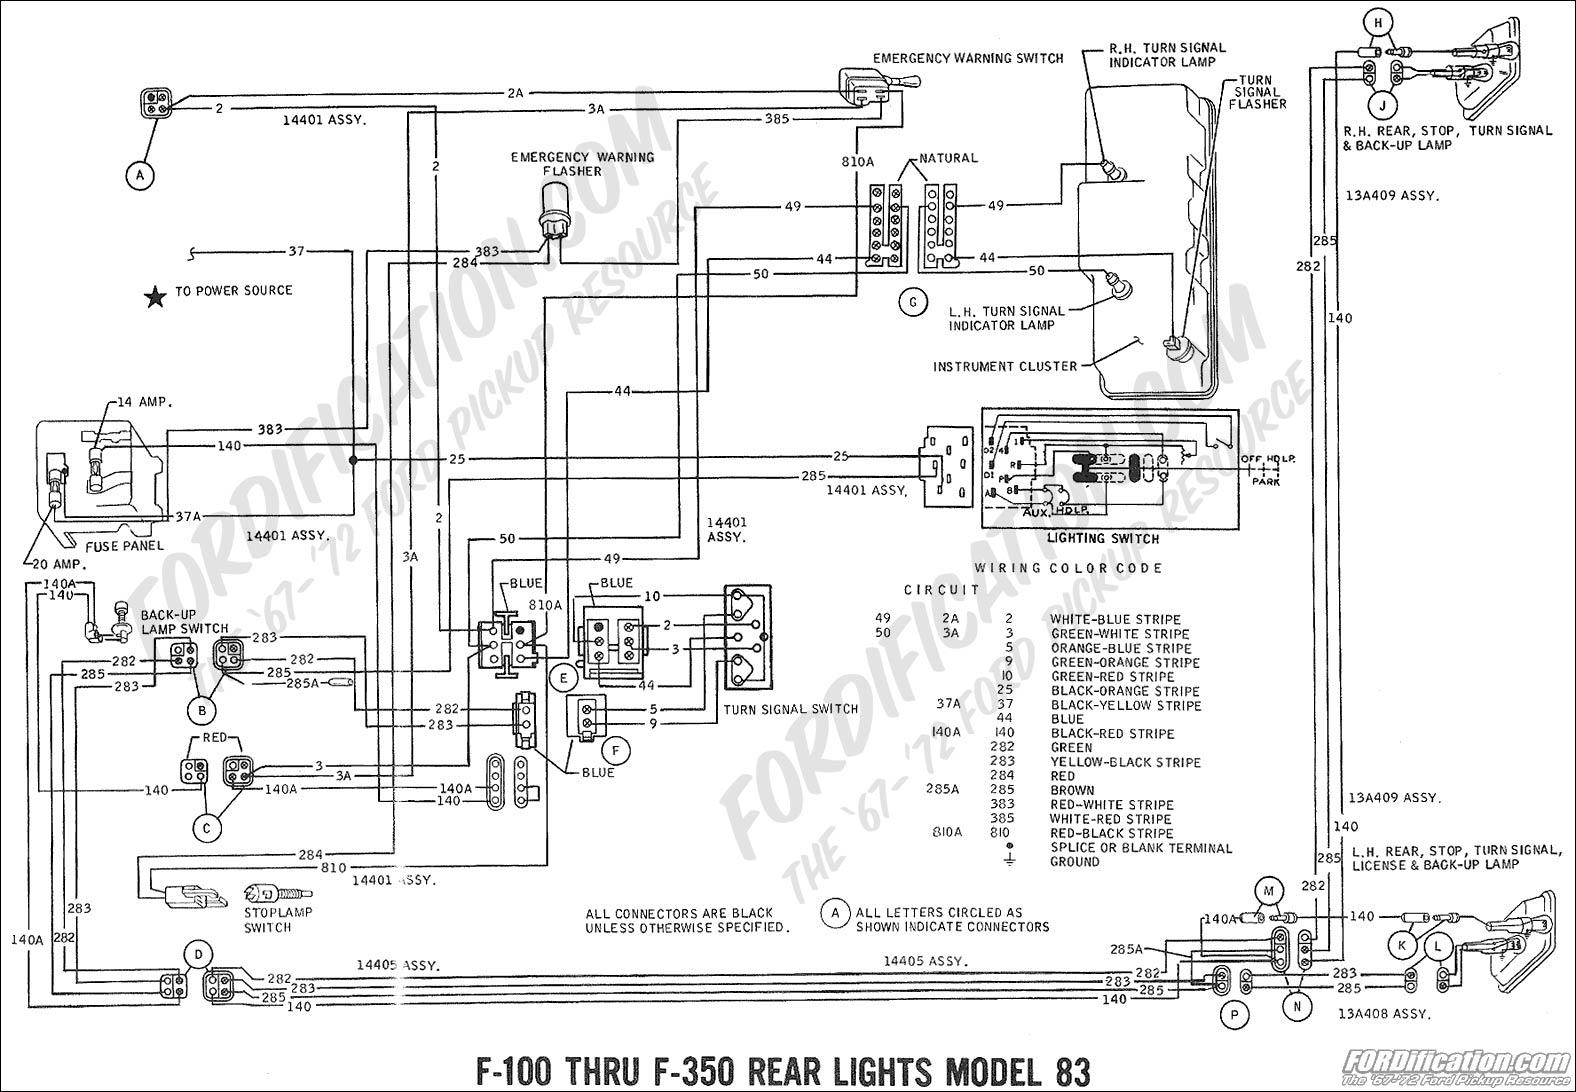 [EQHS_1162]  SM_3398] 1977 Ford Pinto Wiring Diagram Wiring Diagram | 1966 Ford Pinto Wiring Diagram |  | Gue45 Xlexi Abole Phan Gious Sequ Diog Ginou Pelap Elec Mohammedshrine  Librar Wiring 101